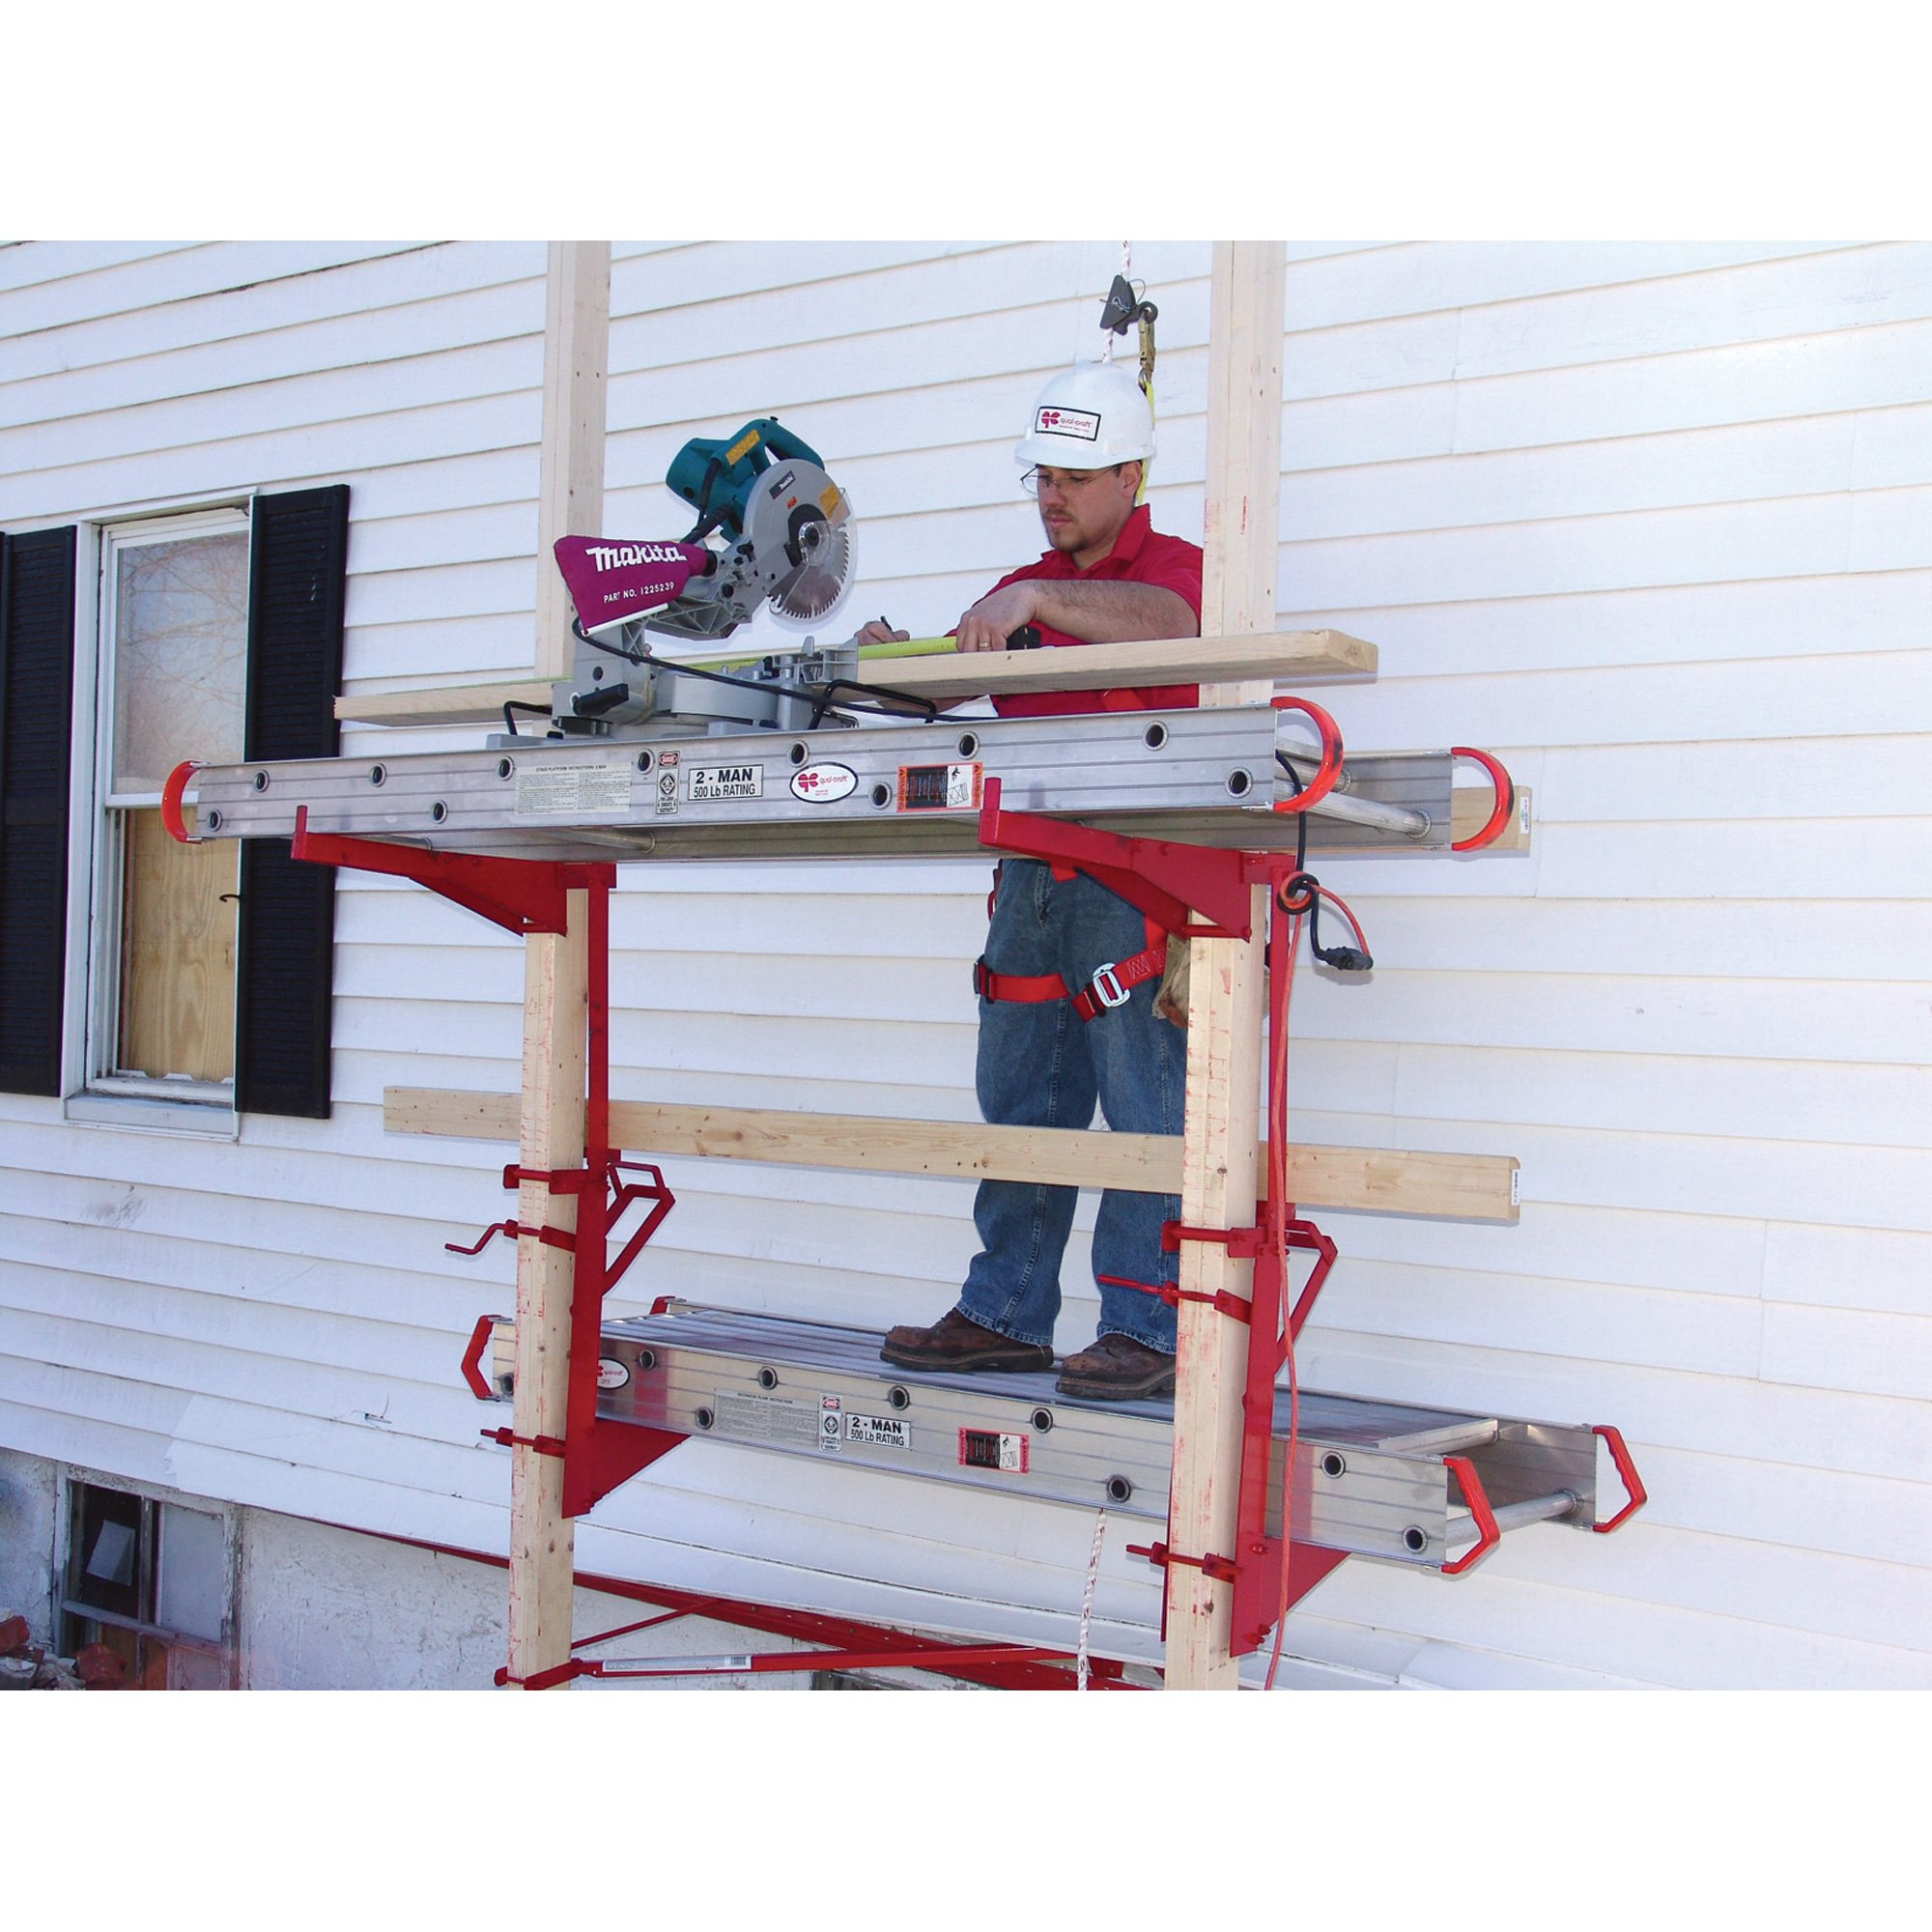 Qual-Craft Steel Pump Jack System Kit - 500-Lb. Capacity, Model Number 2214 by Qualcraft